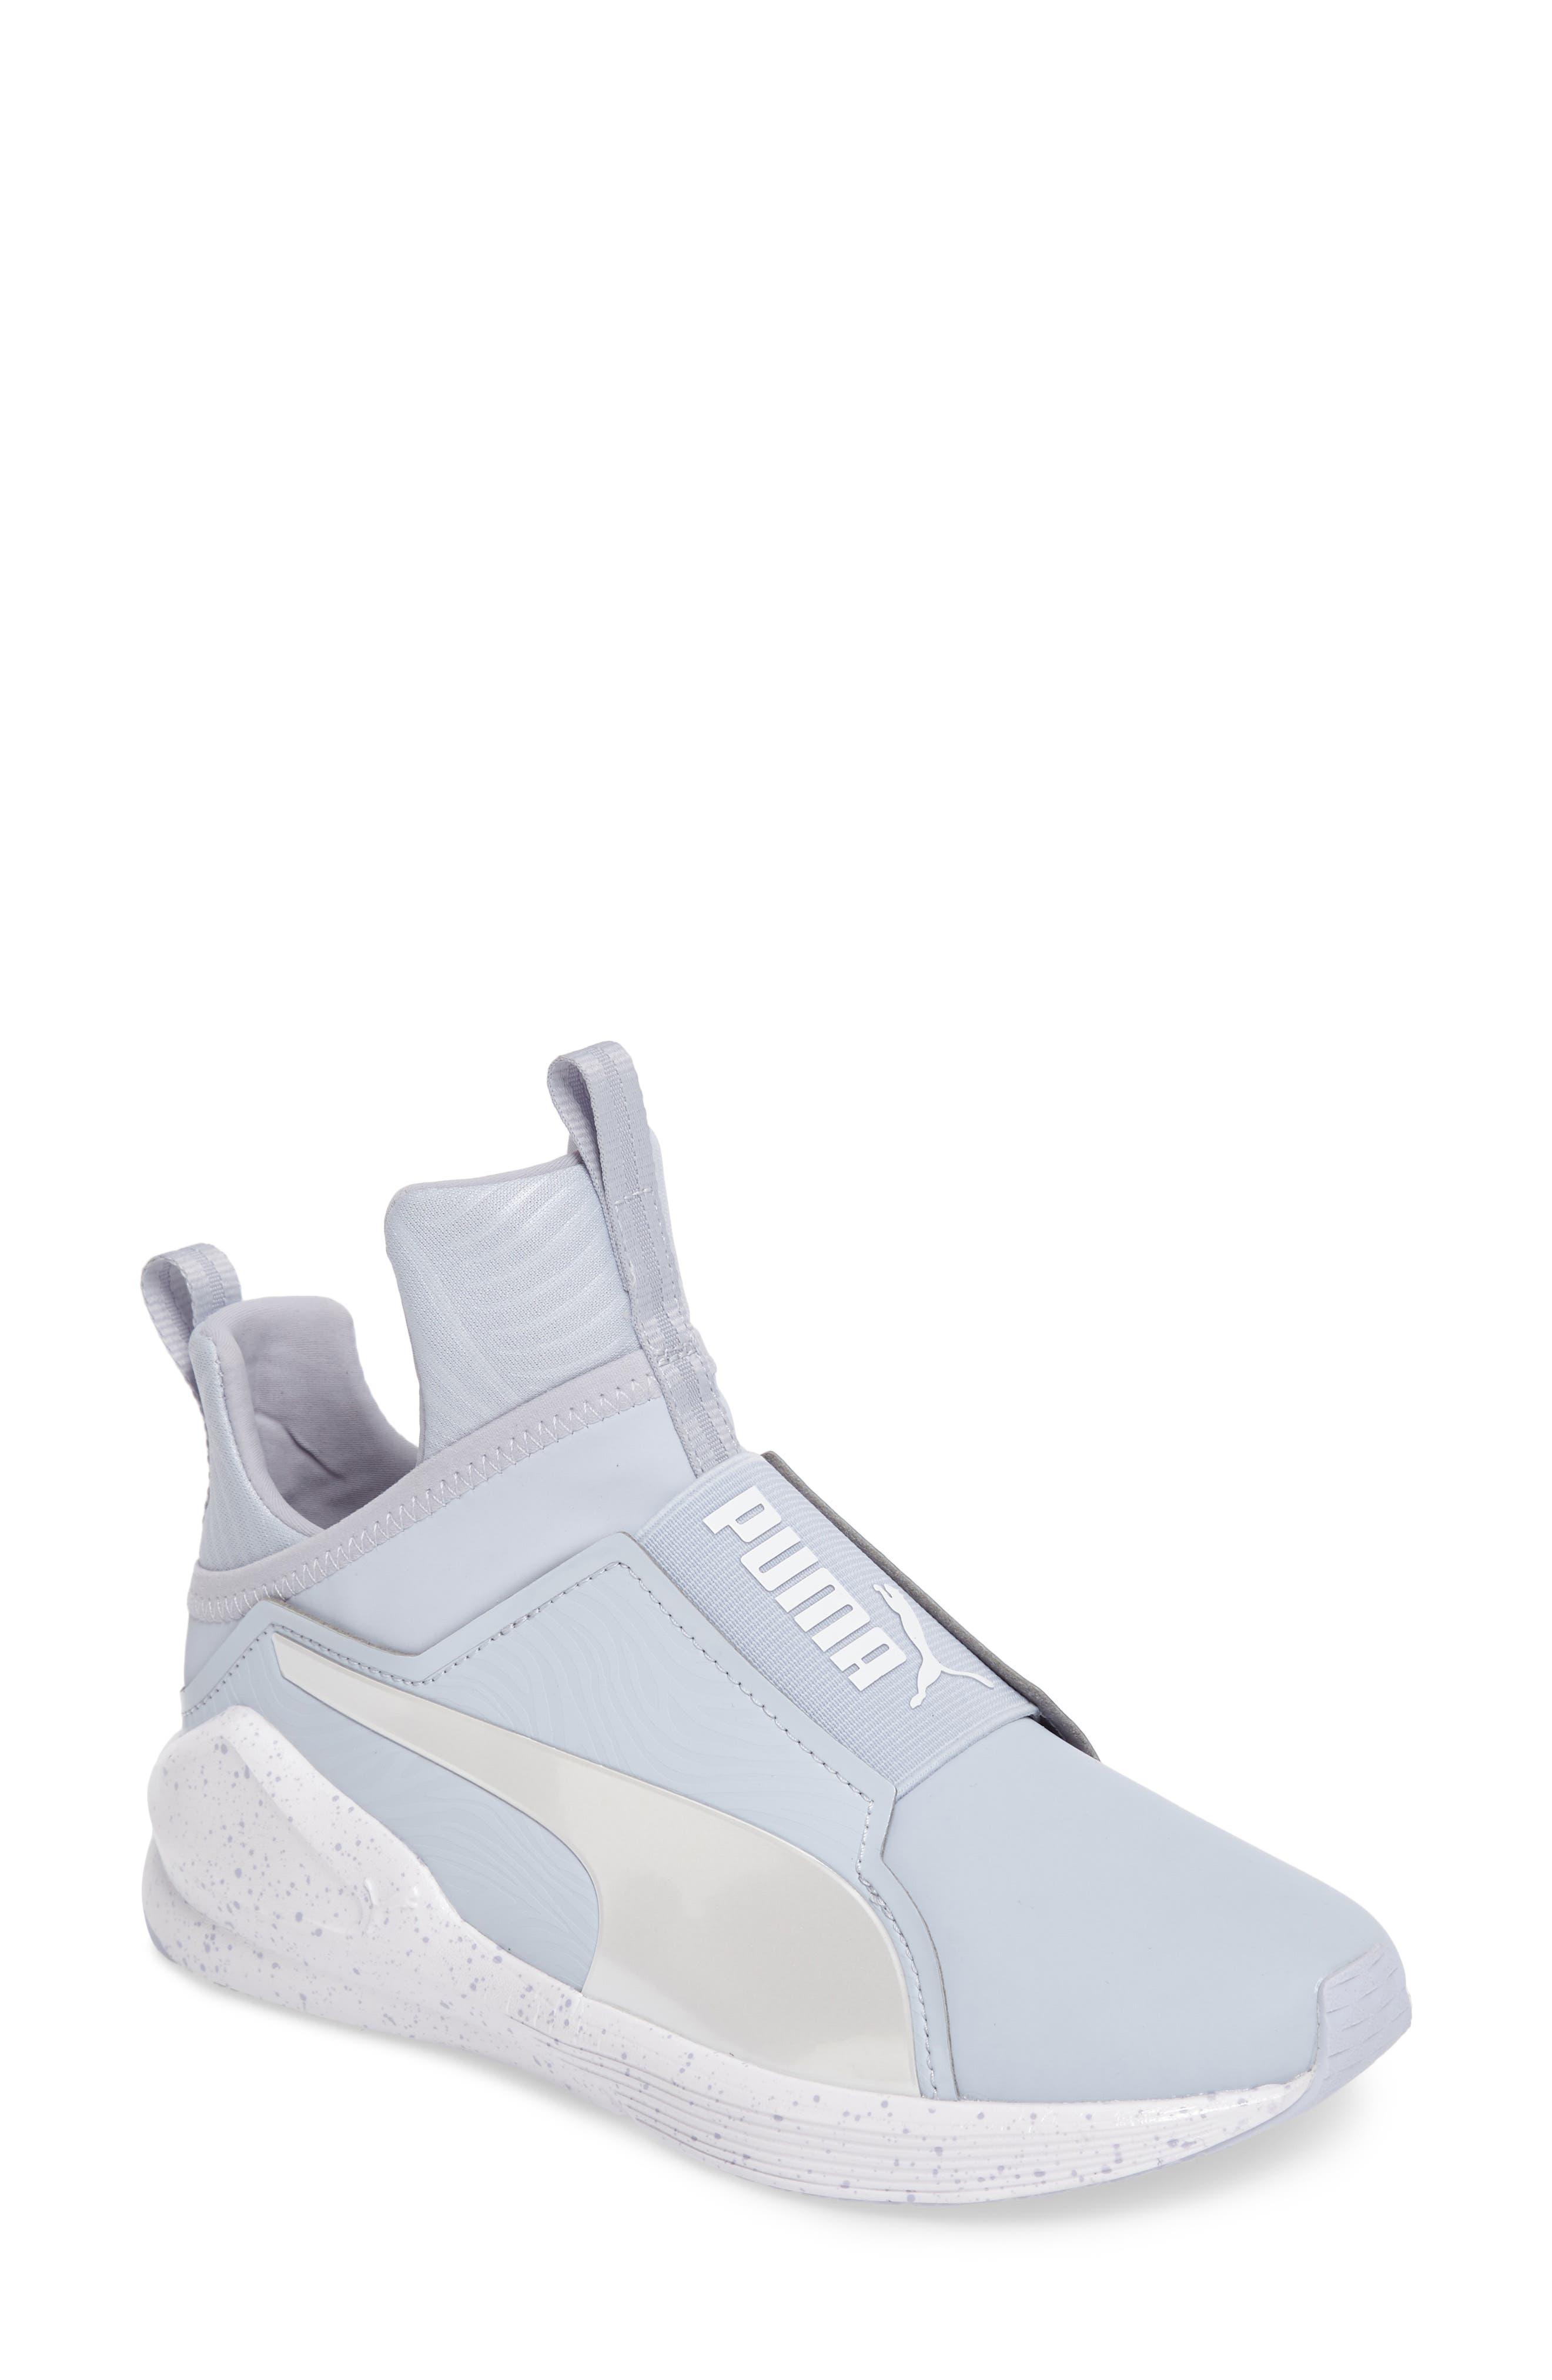 Fierce Bleached High Top Sneaker,                             Main thumbnail 1, color,                             400